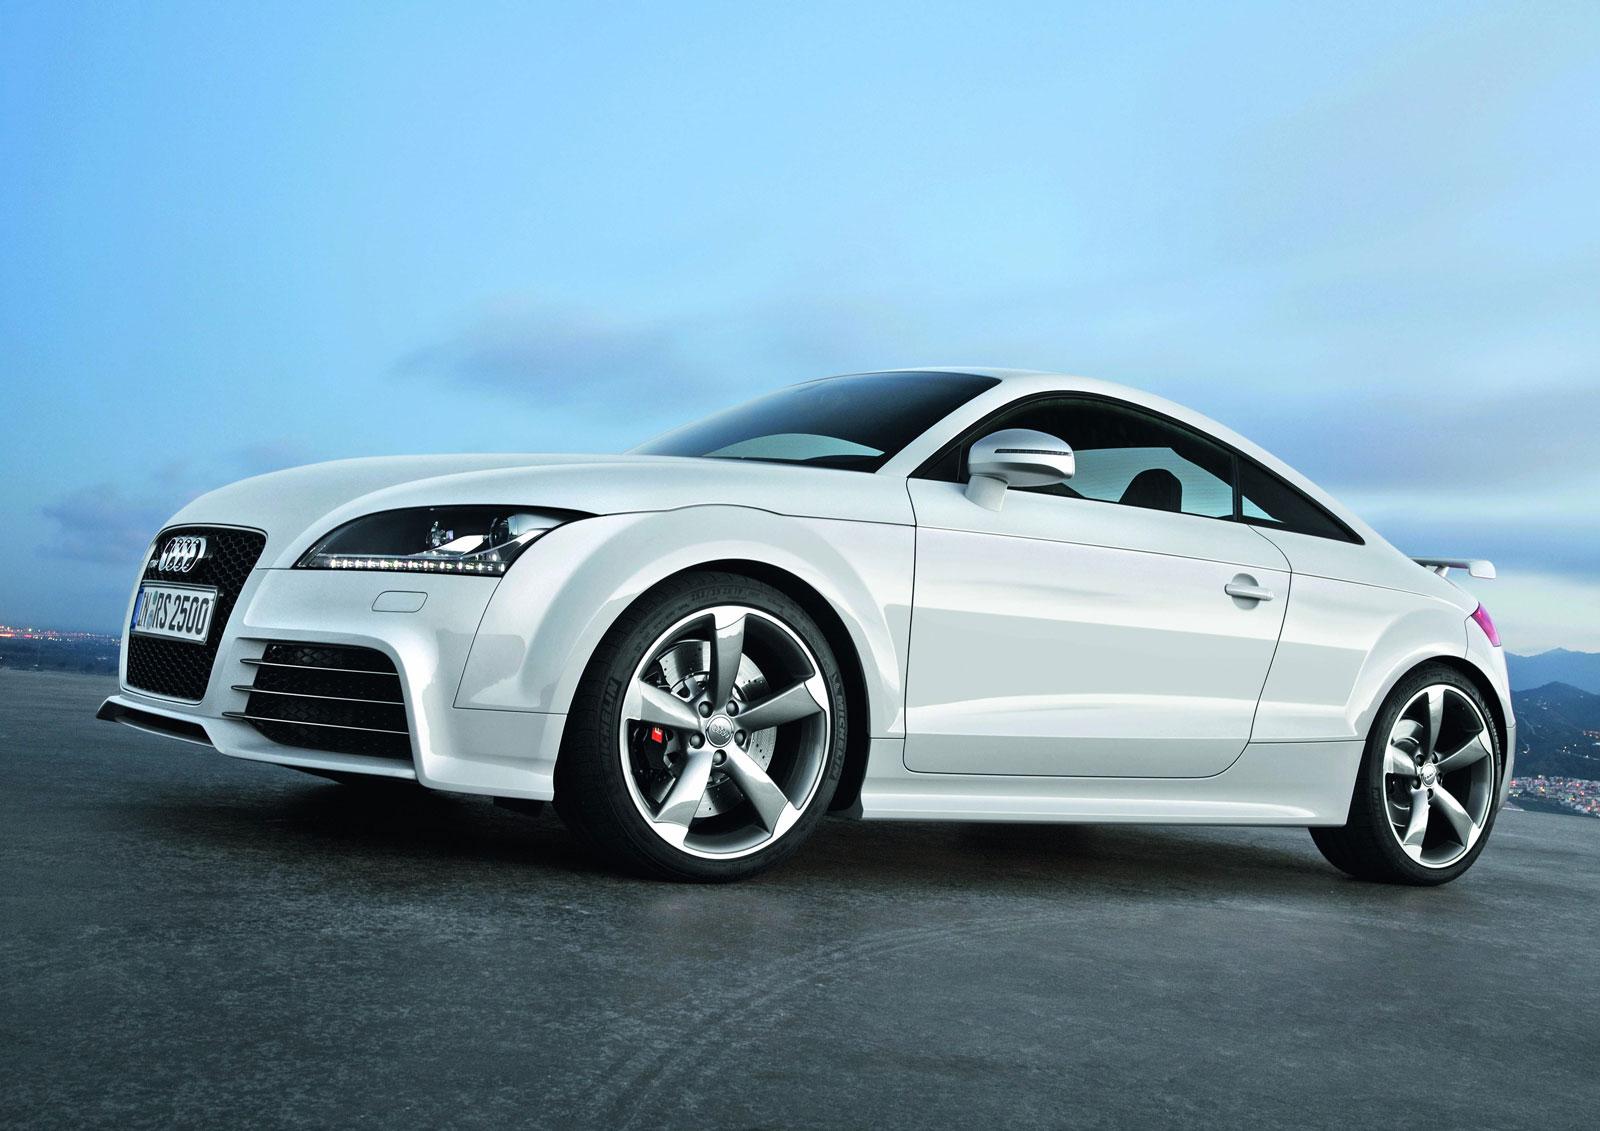 Audi TT RS Wallpapers HD Download 1600x1131